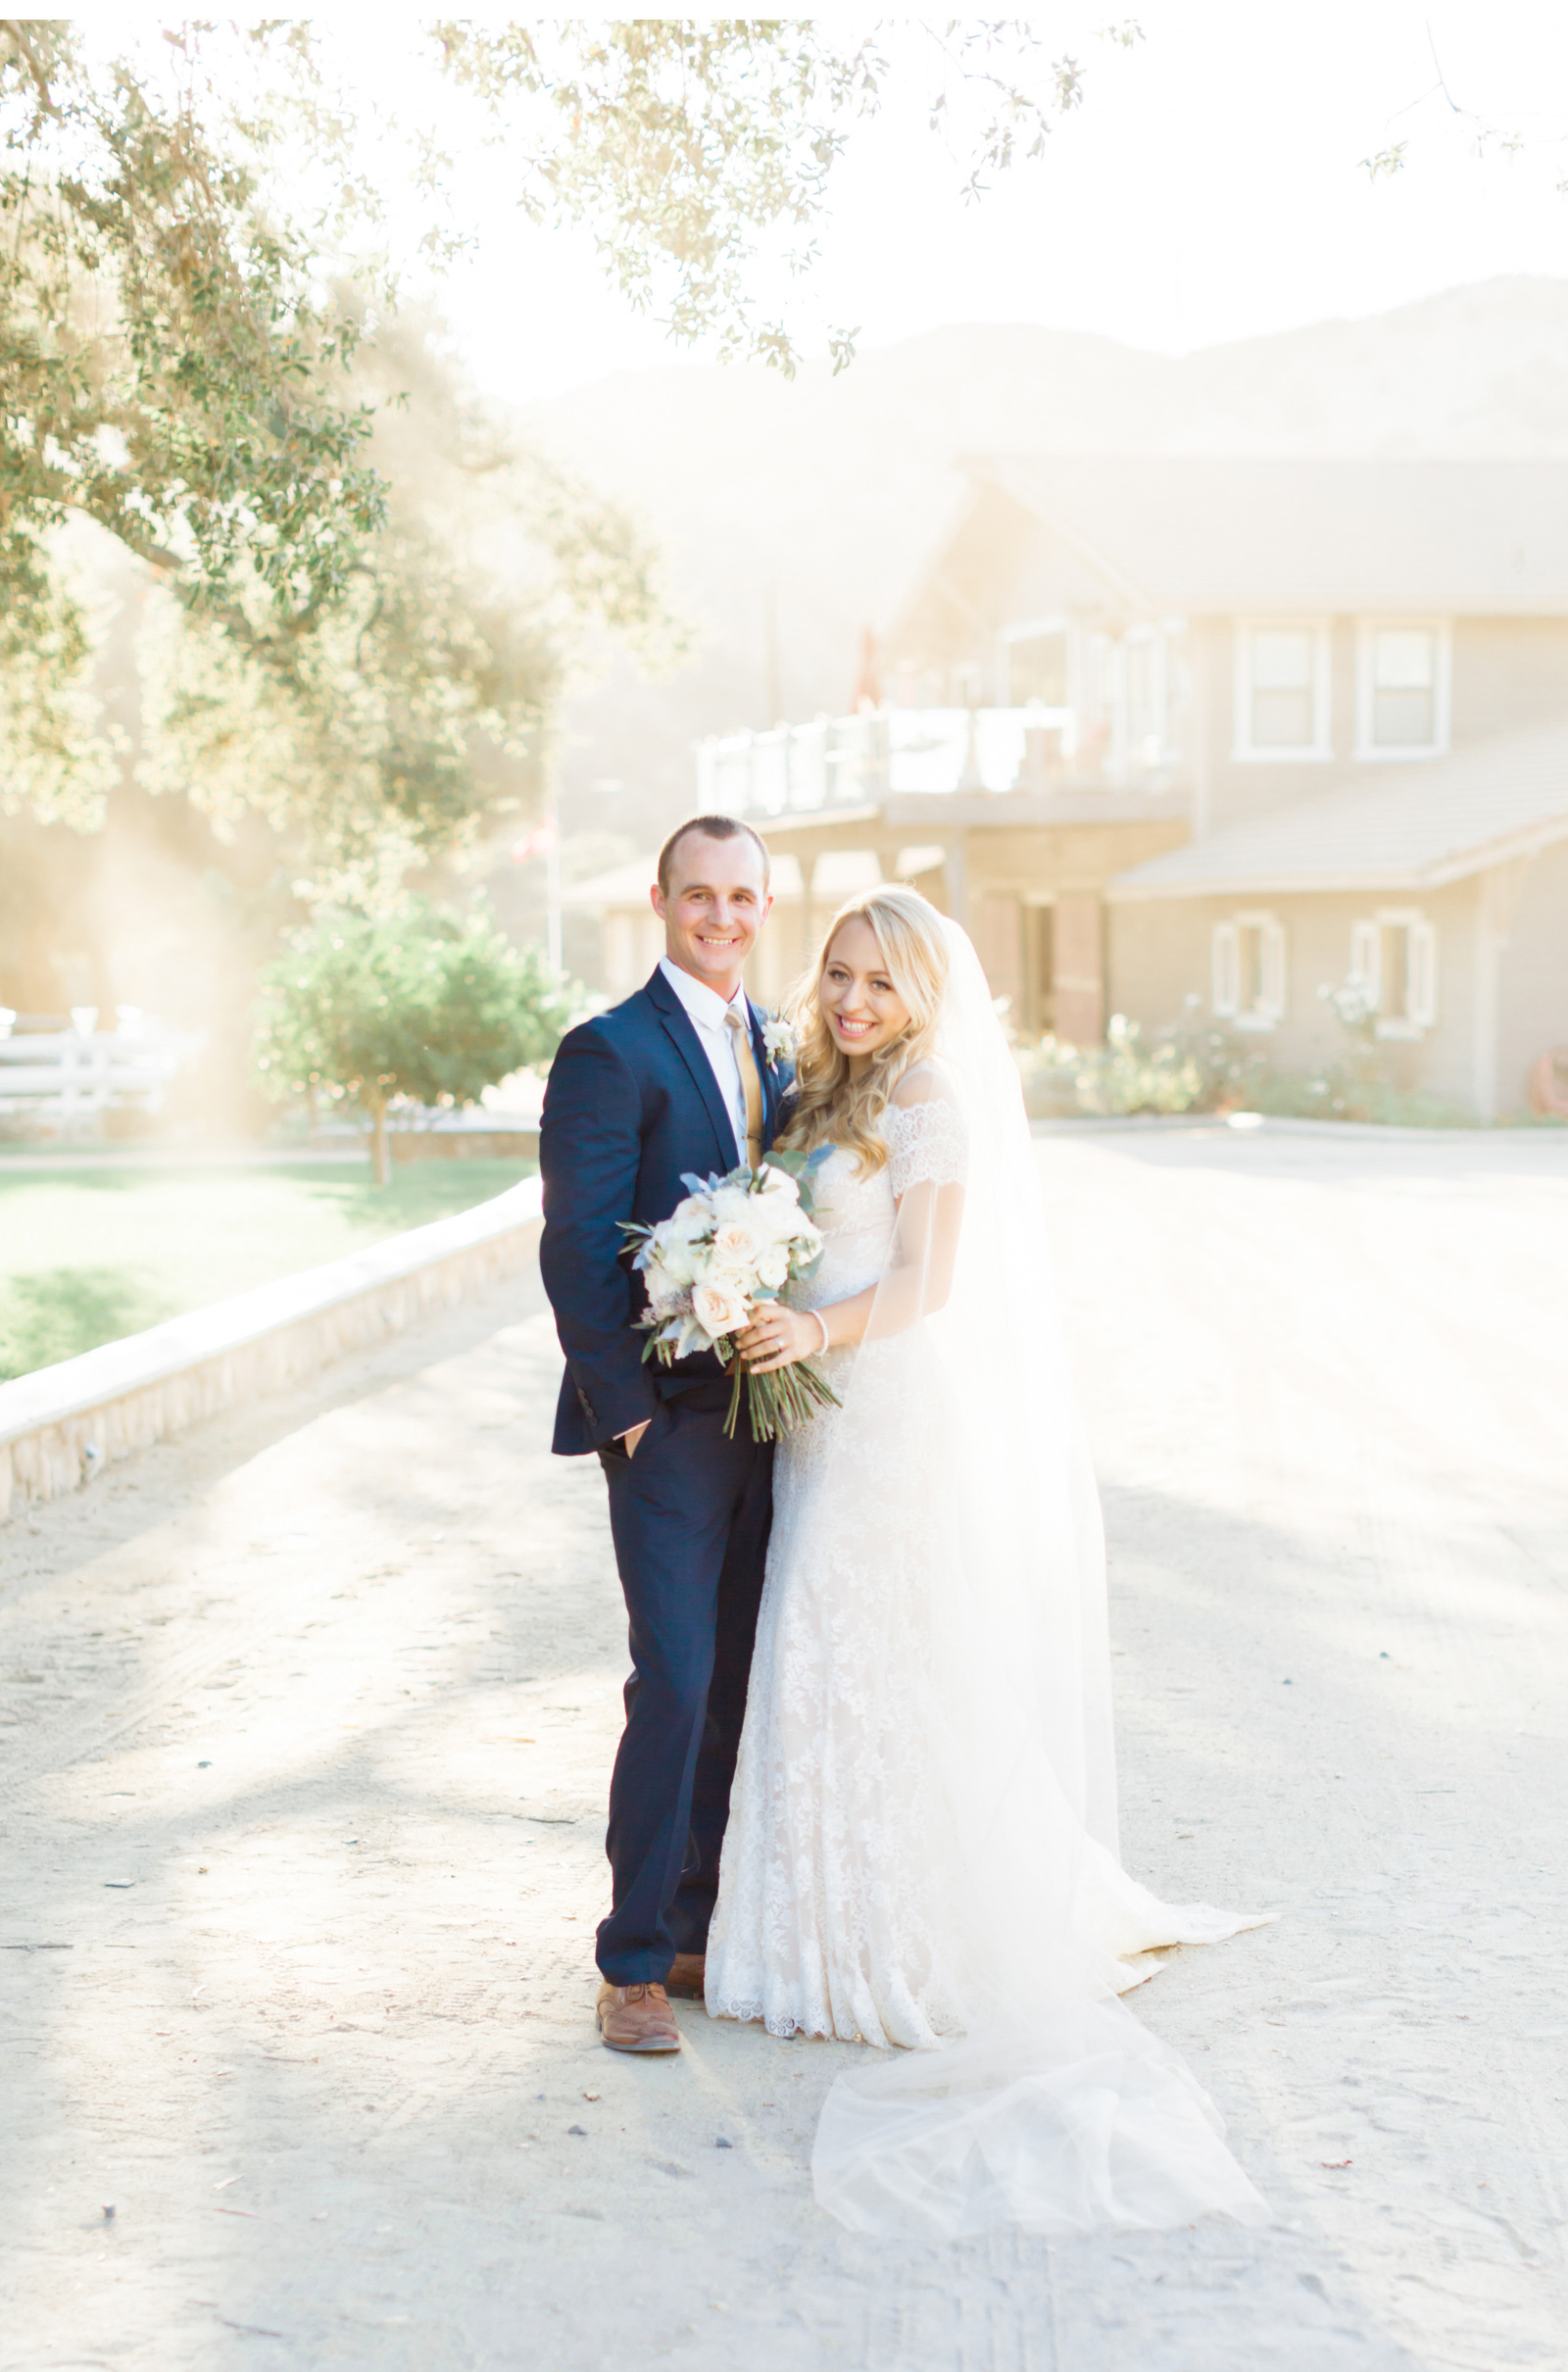 Style-Me-Pretty-Wedding-Photographer-Natalie-Schutt-Photography-Calfornia-San-Luis-Obispo_09.jpg